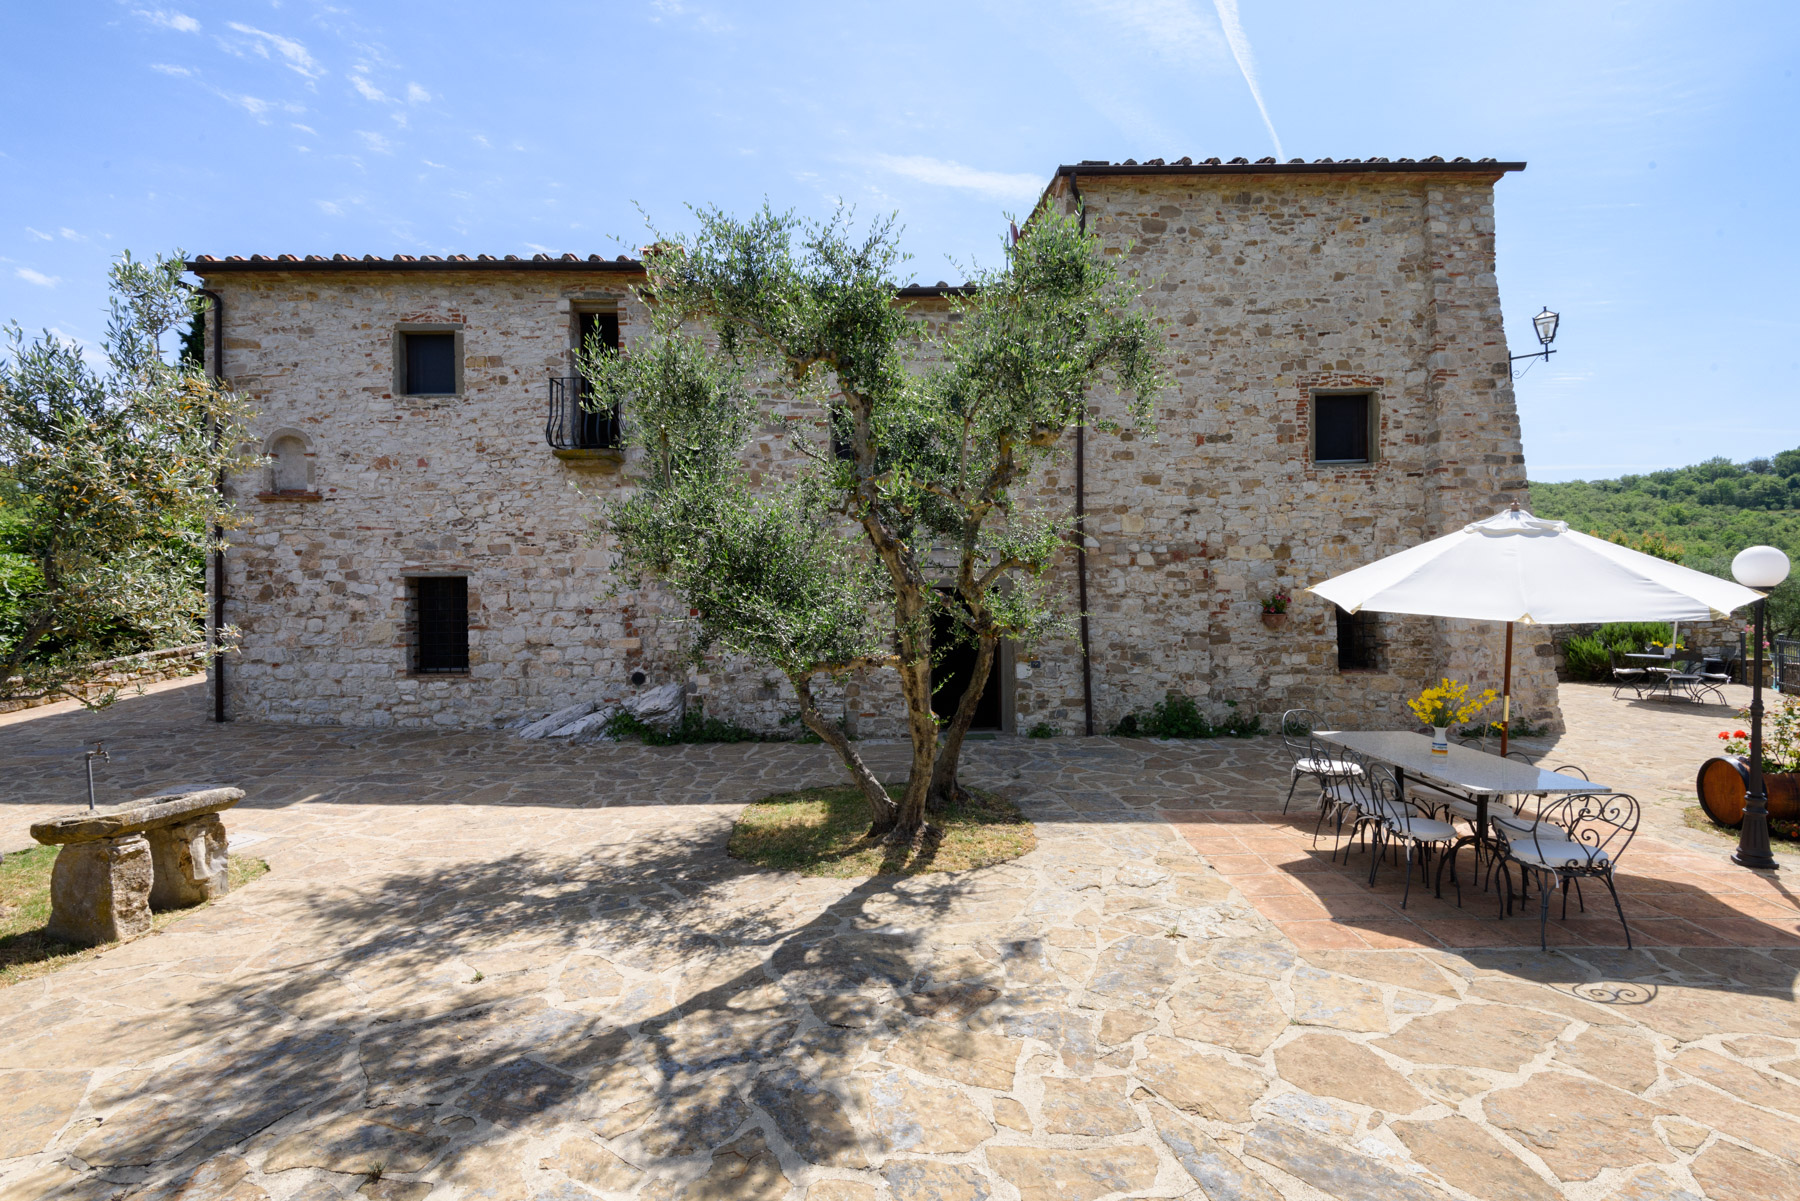 Rustico in Vendita a Castellina In Chianti: 5 locali, 650 mq - Foto 4